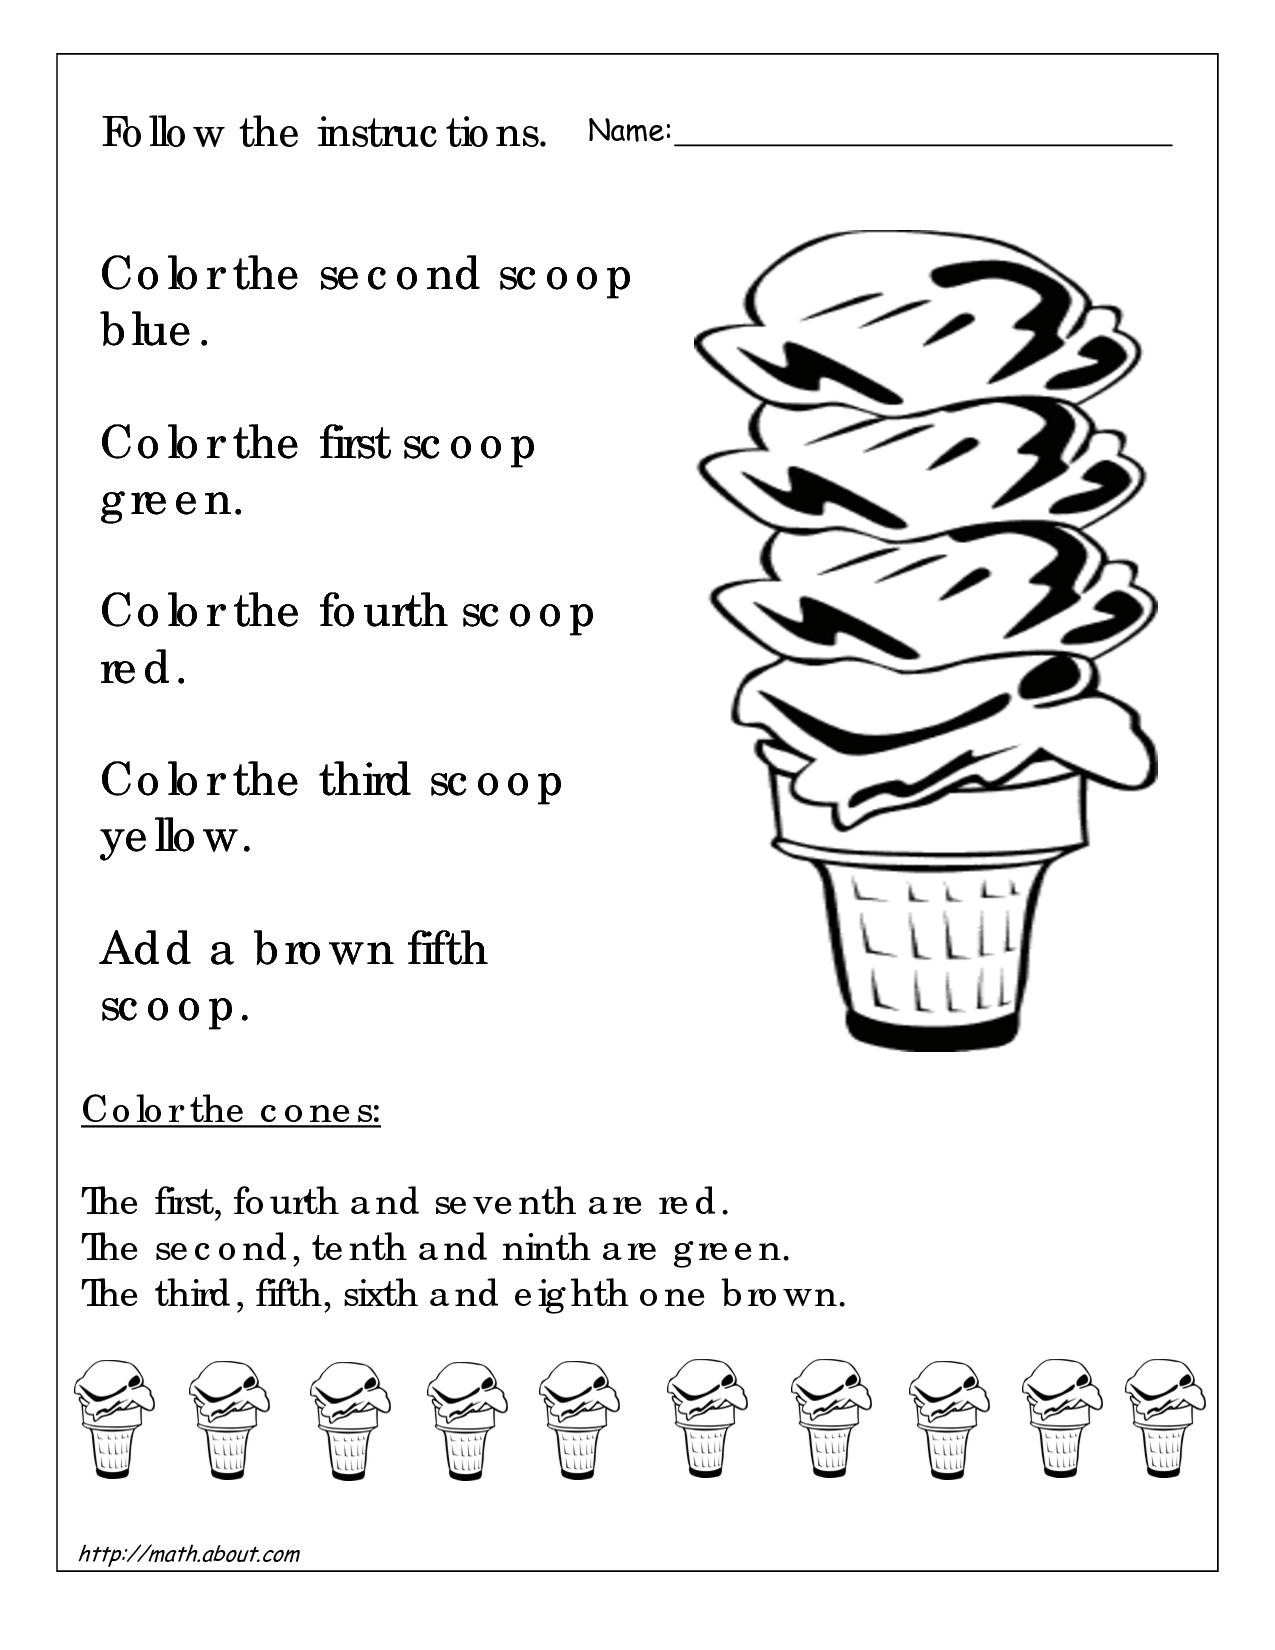 13 Images of Christmas Worksheets 3rd Grade   First grade worksheets [ 1650 x 1275 Pixel ]